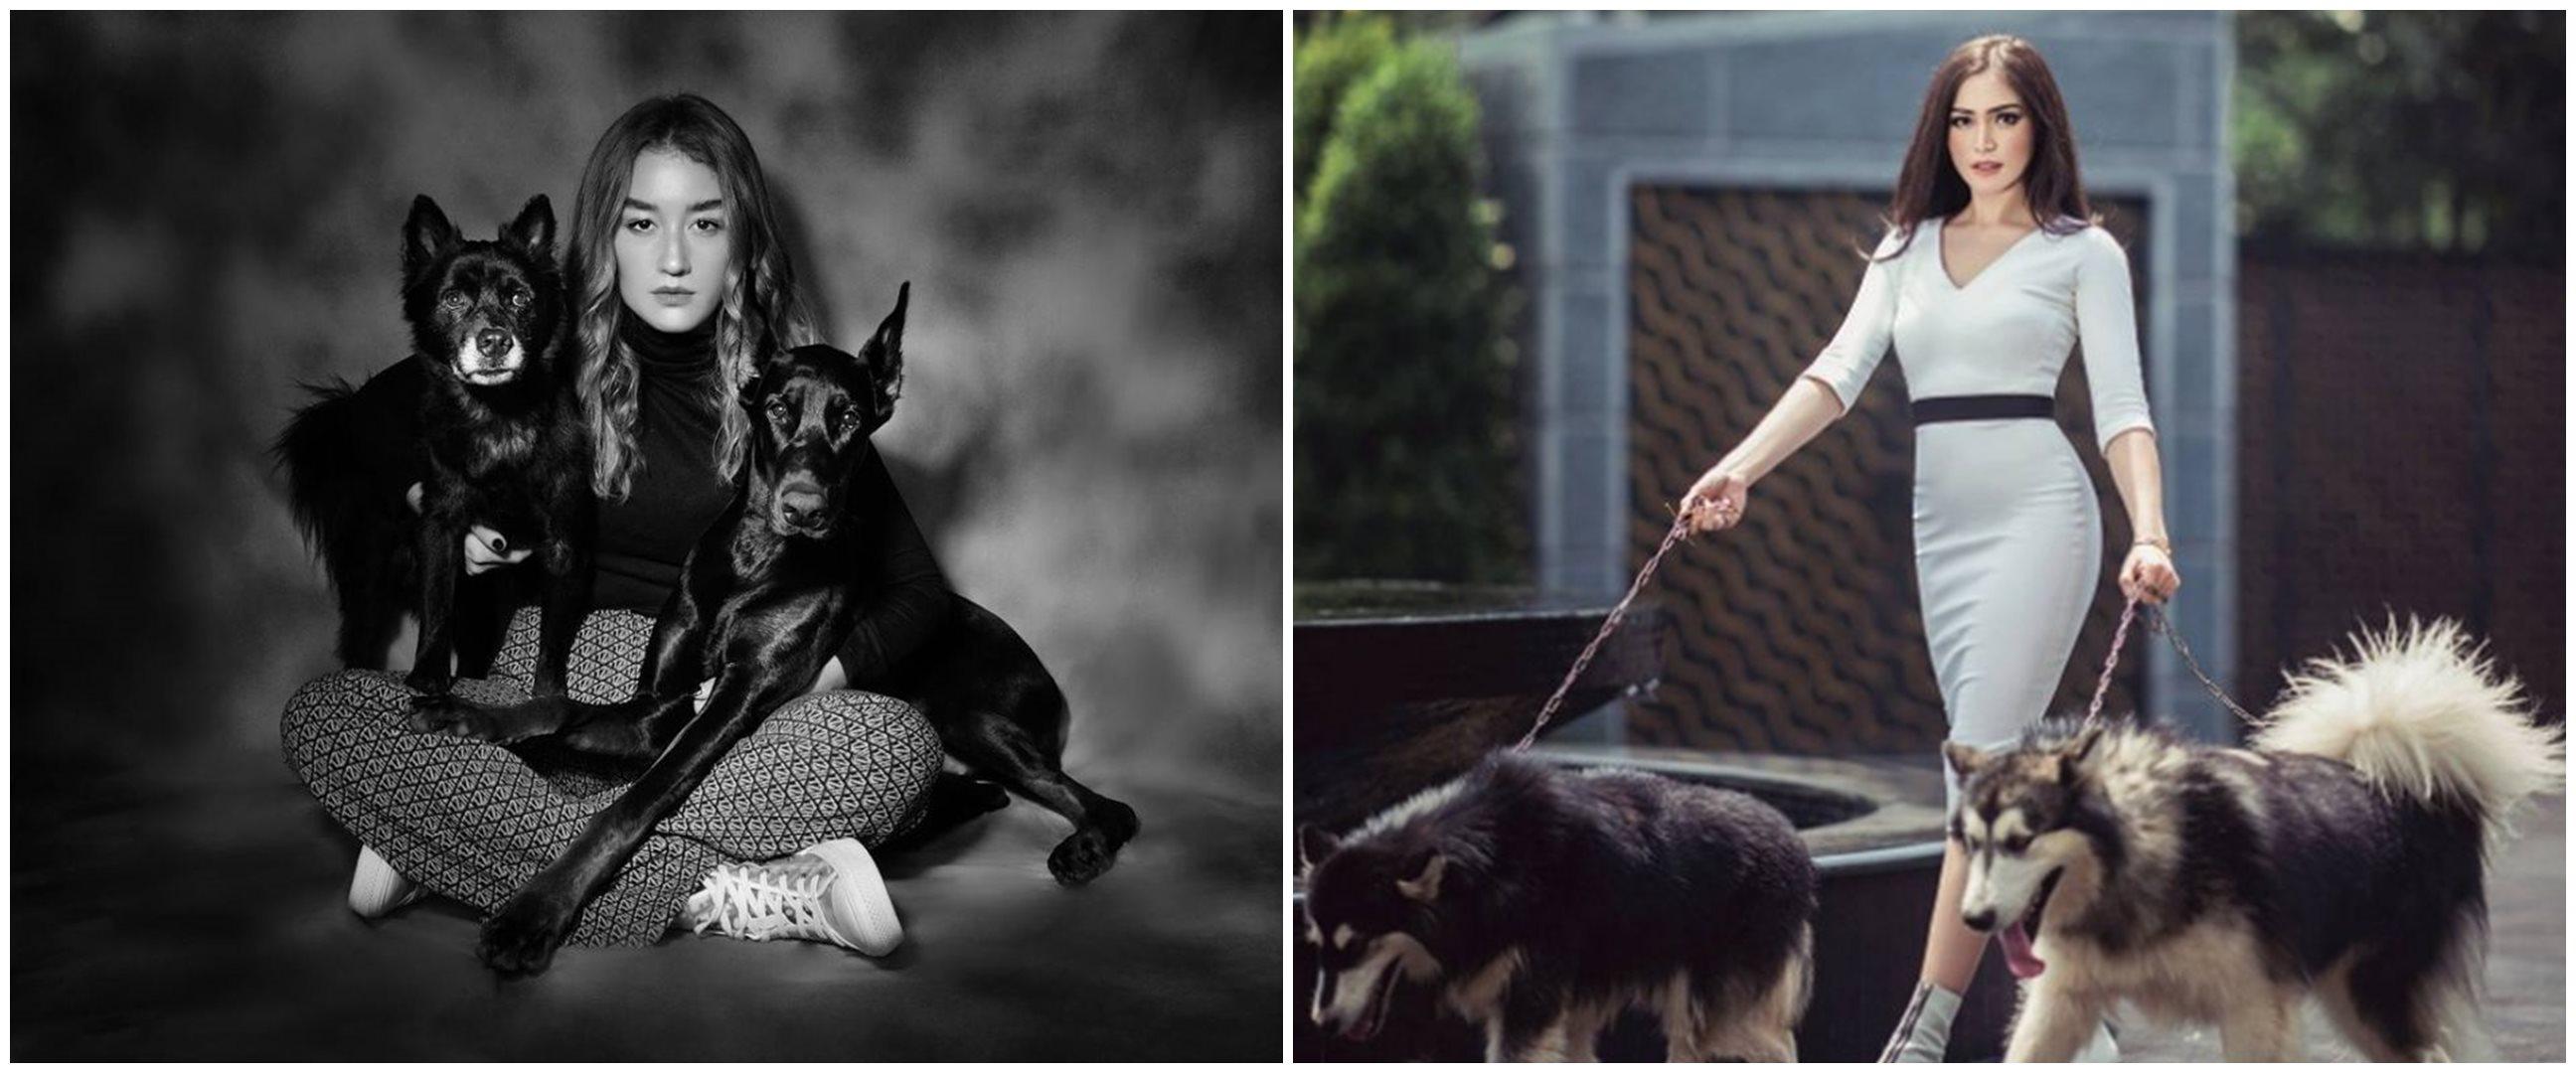 Gaya 10 seleb cantik saat pemotretan dengan anjing